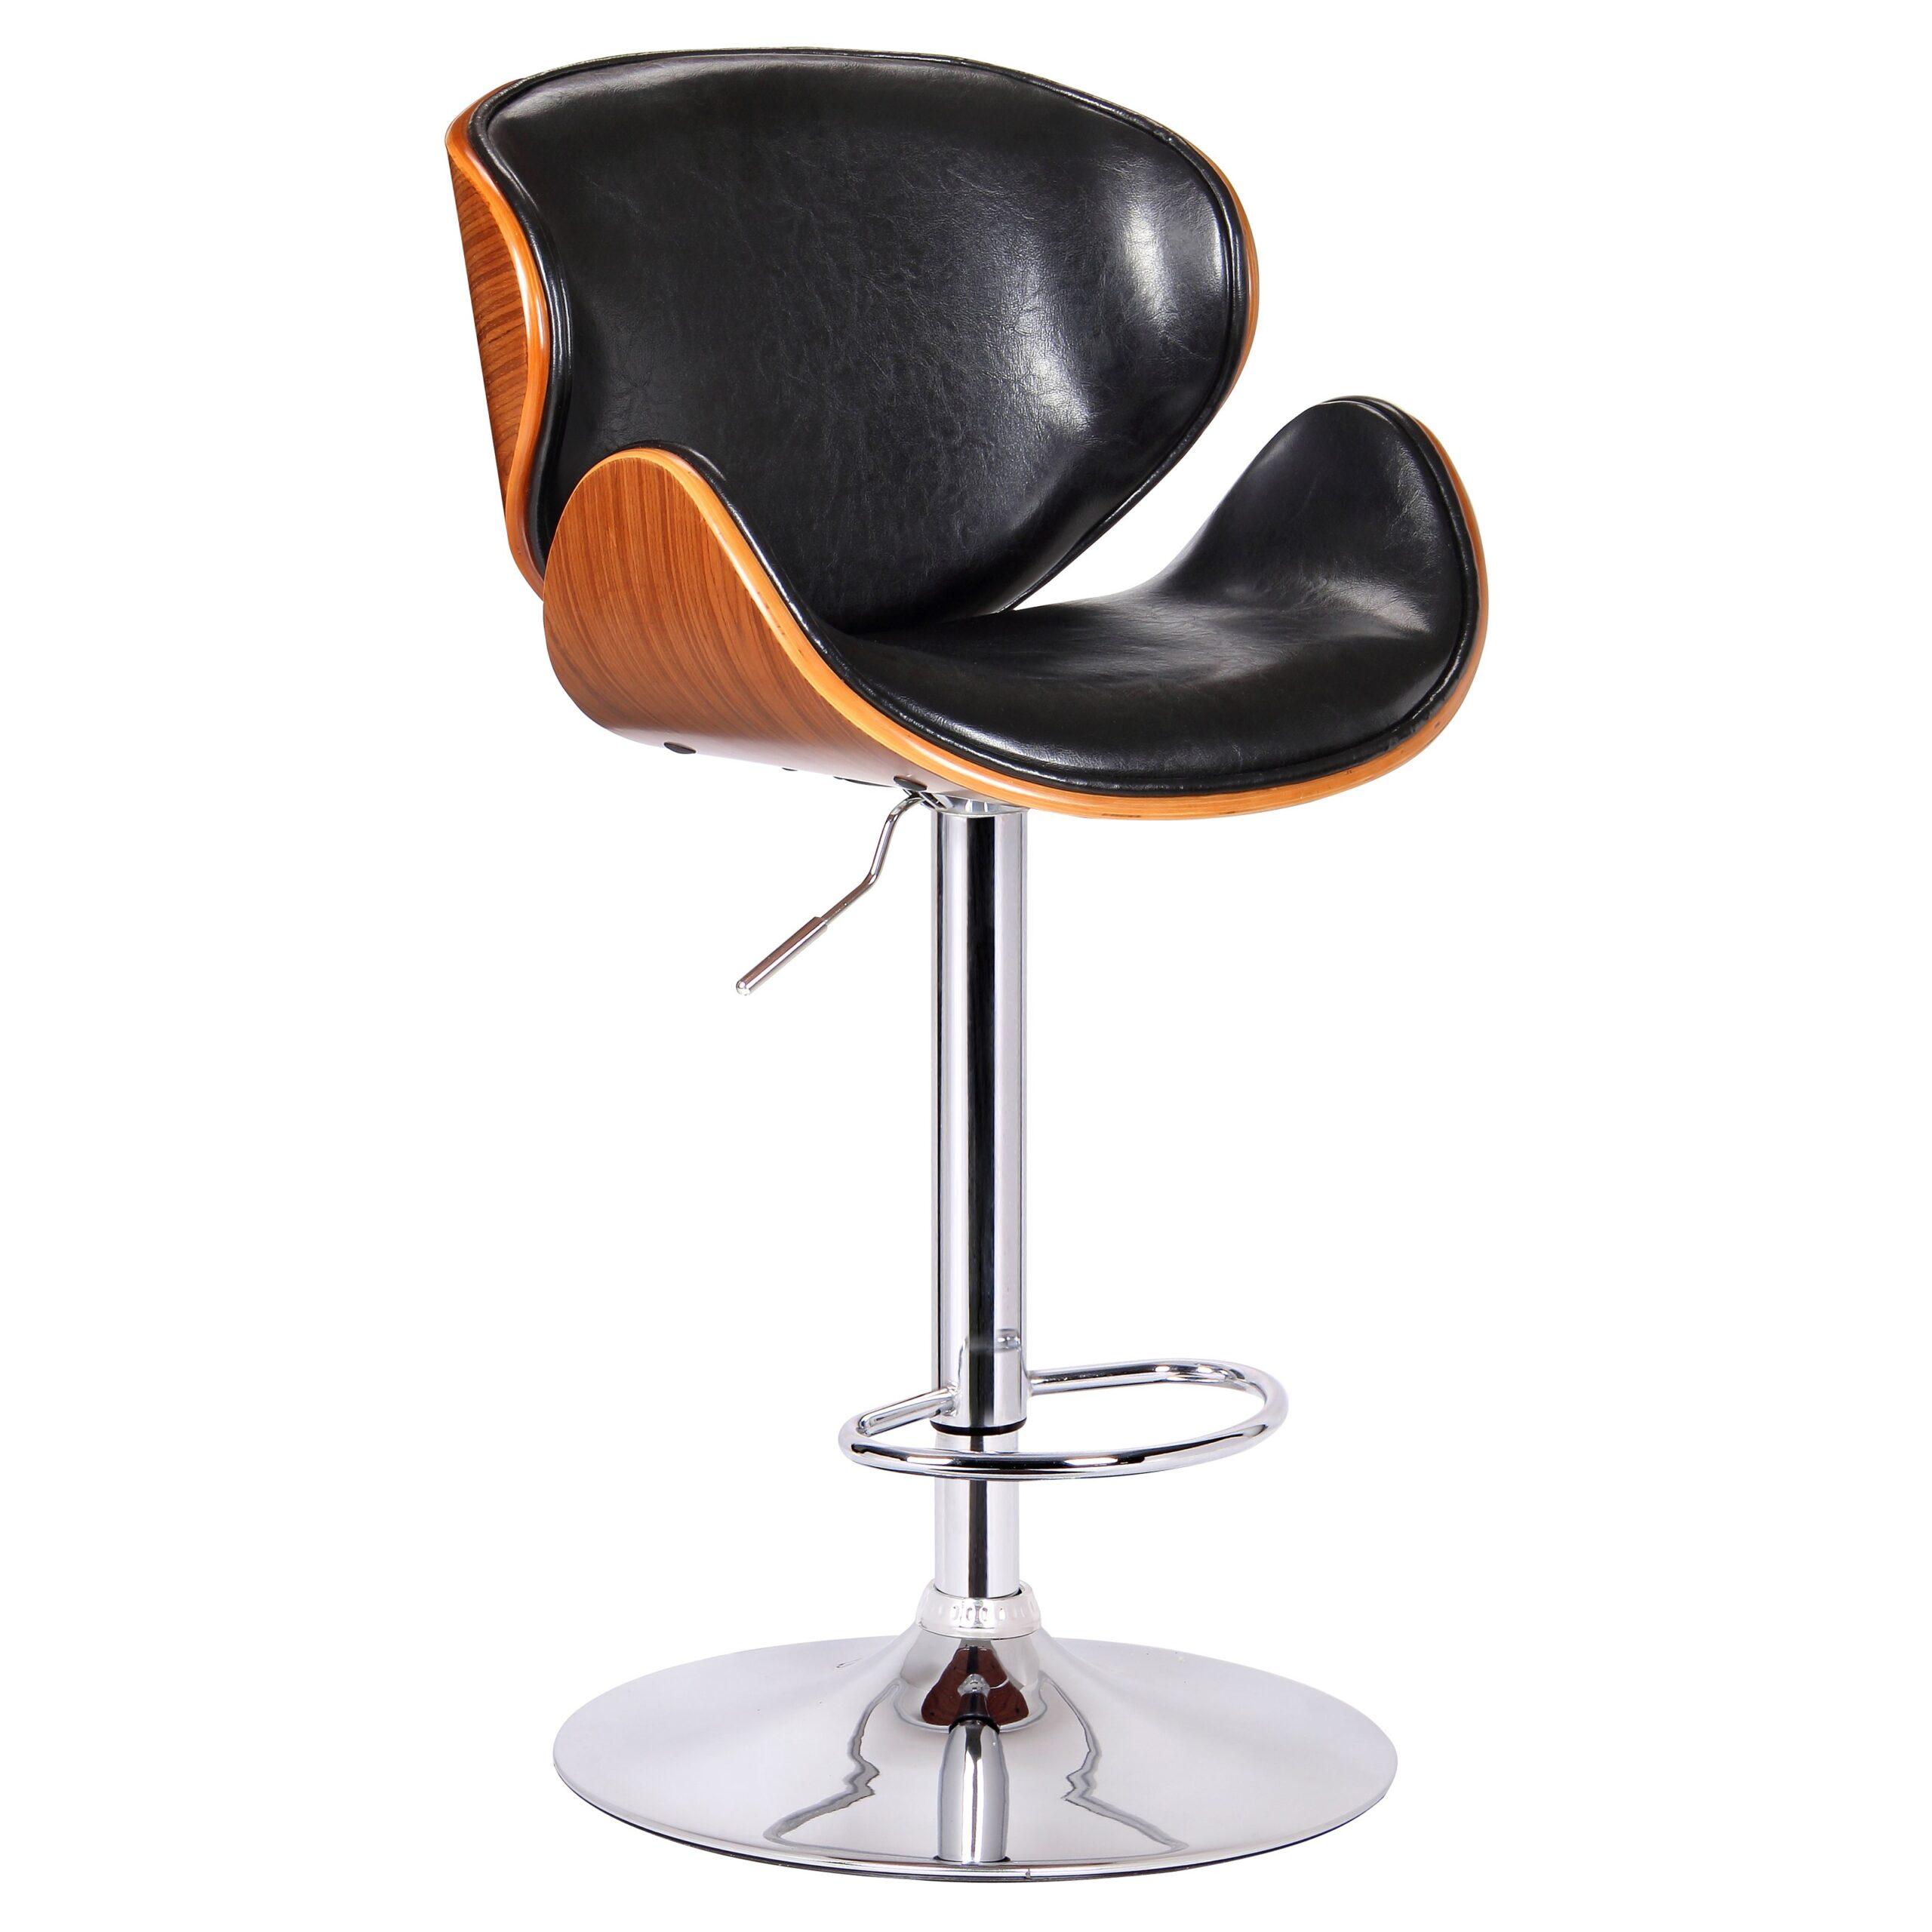 adjustable swivel bar stools with back